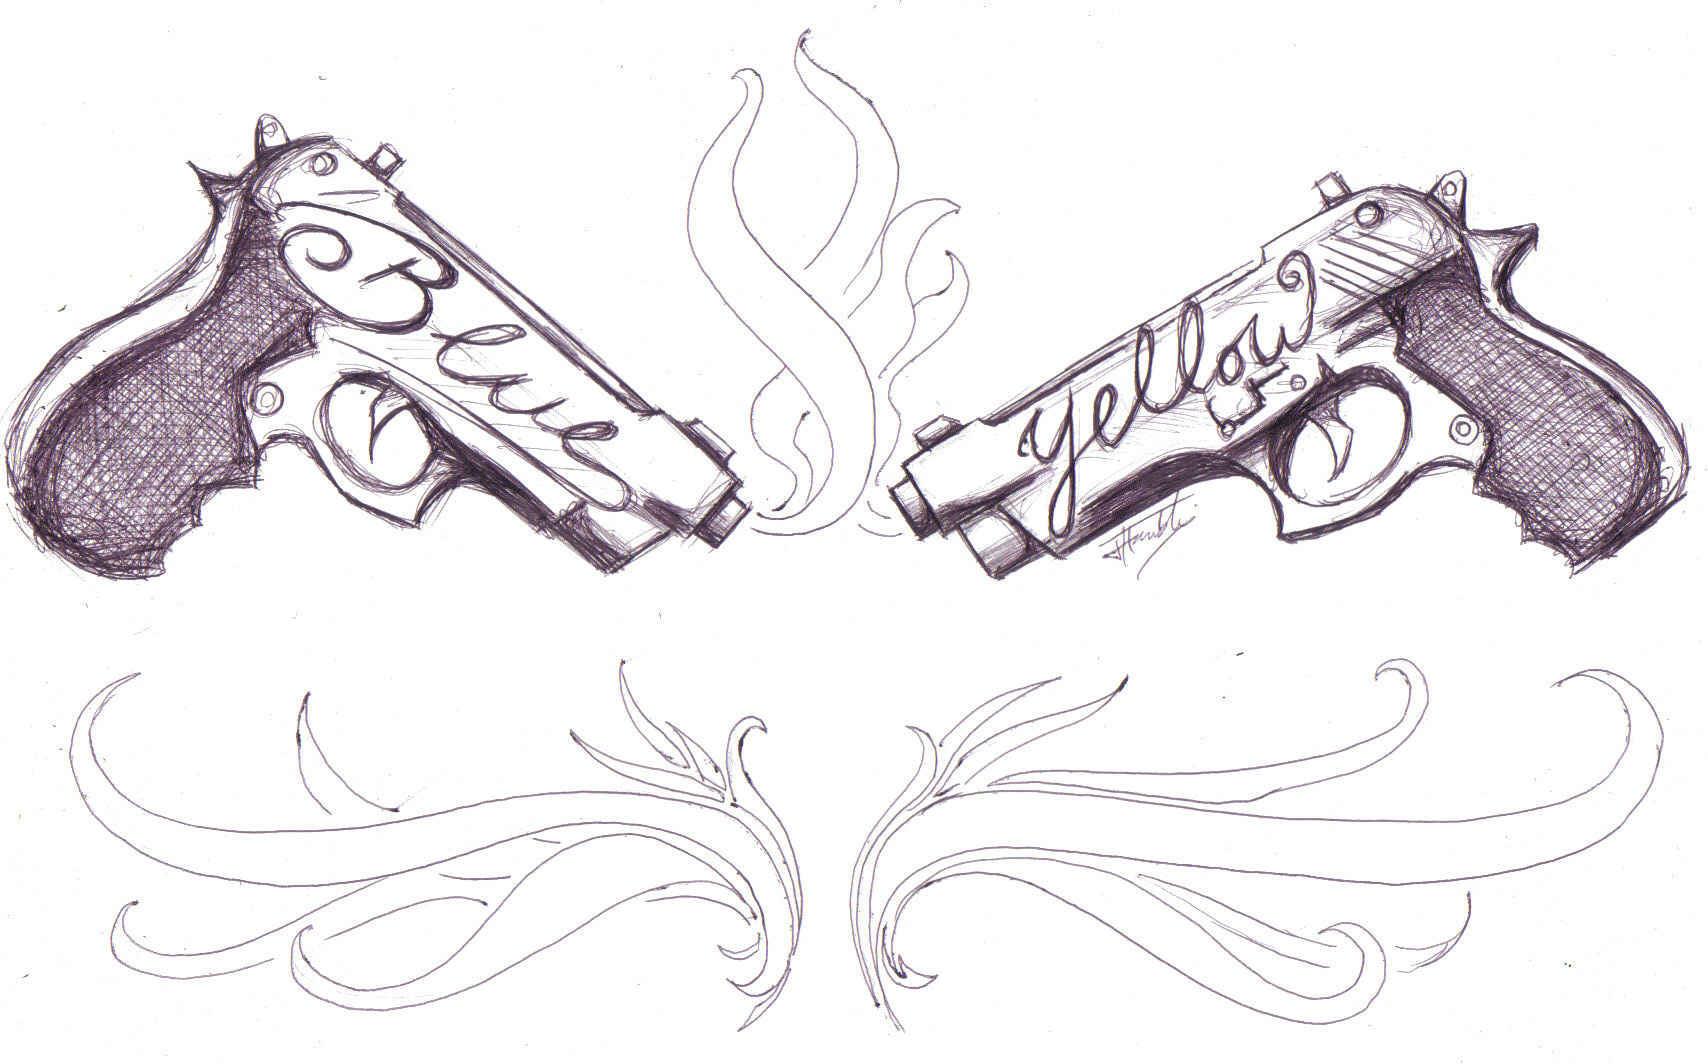 Guns by JoeD-rtman